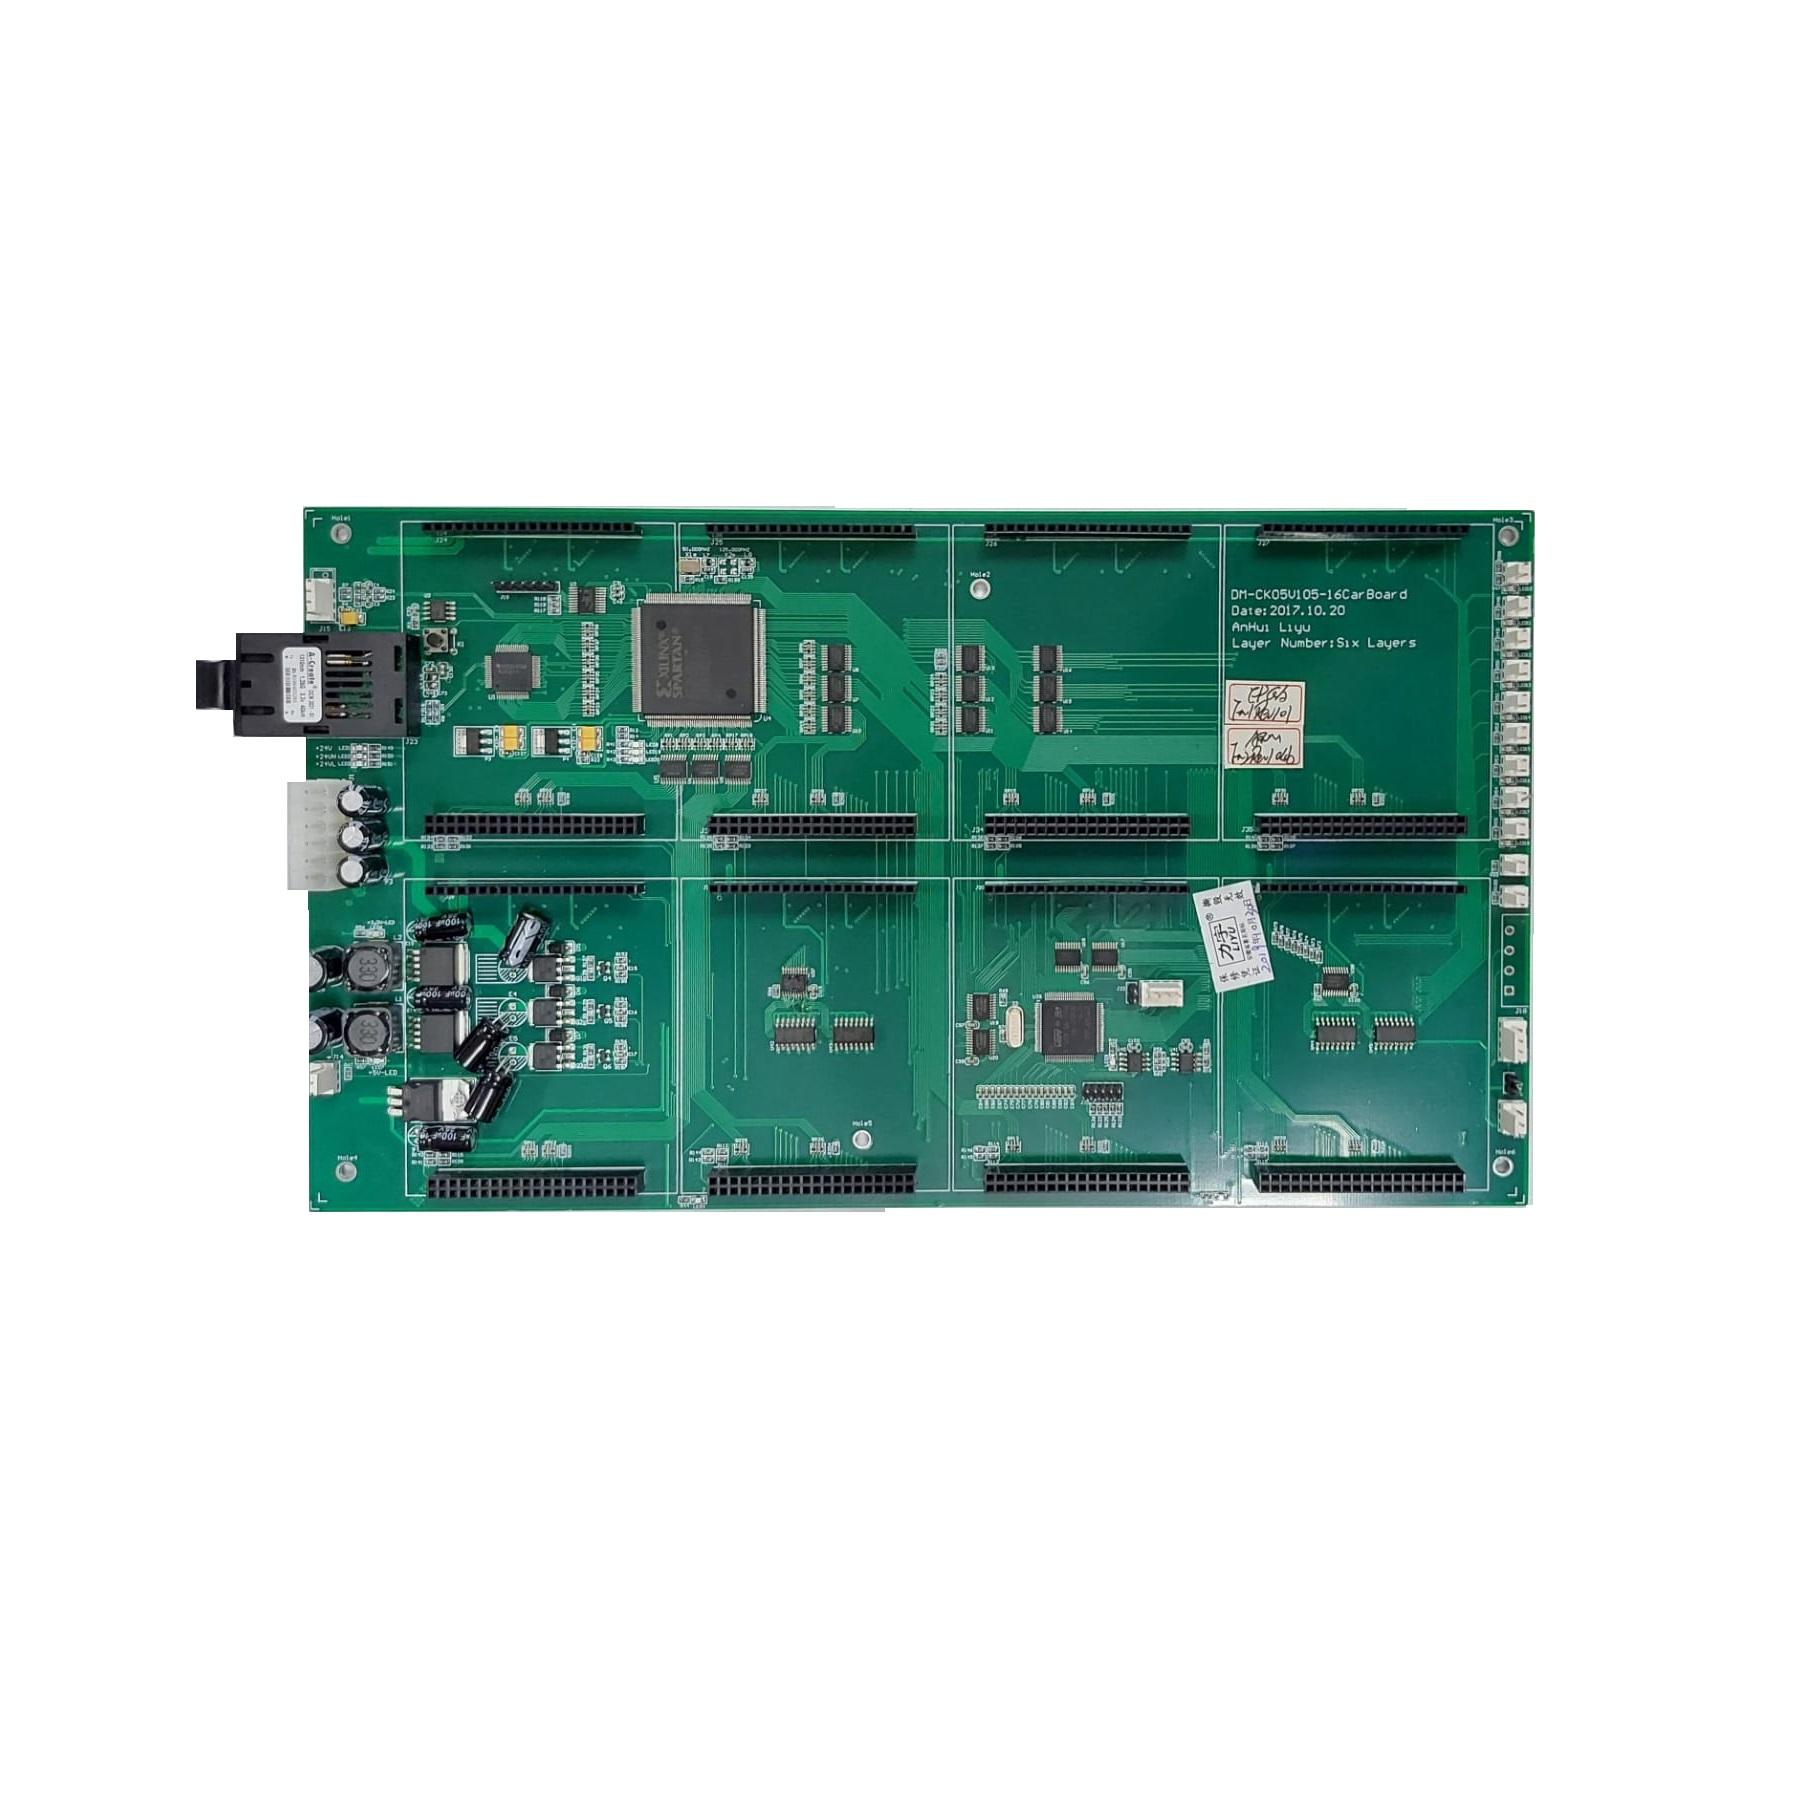 Placa Carriage Board PCB 1024 6pL - Hibrida Q2